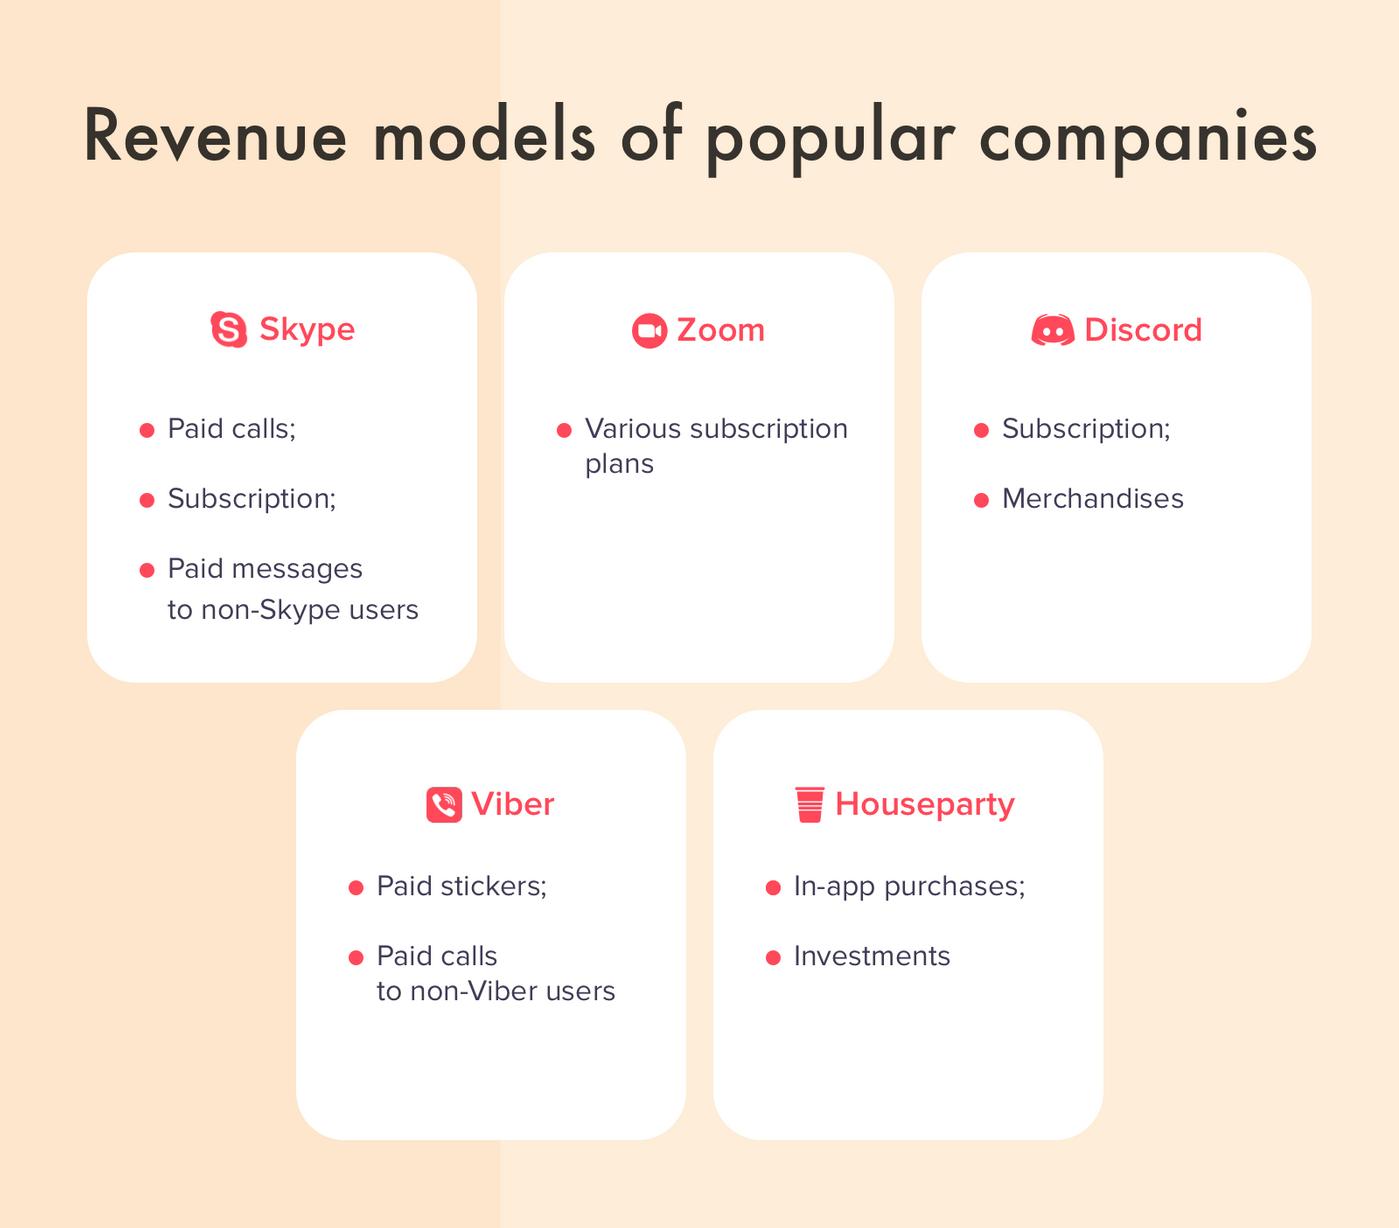 Revenue models of popular companies